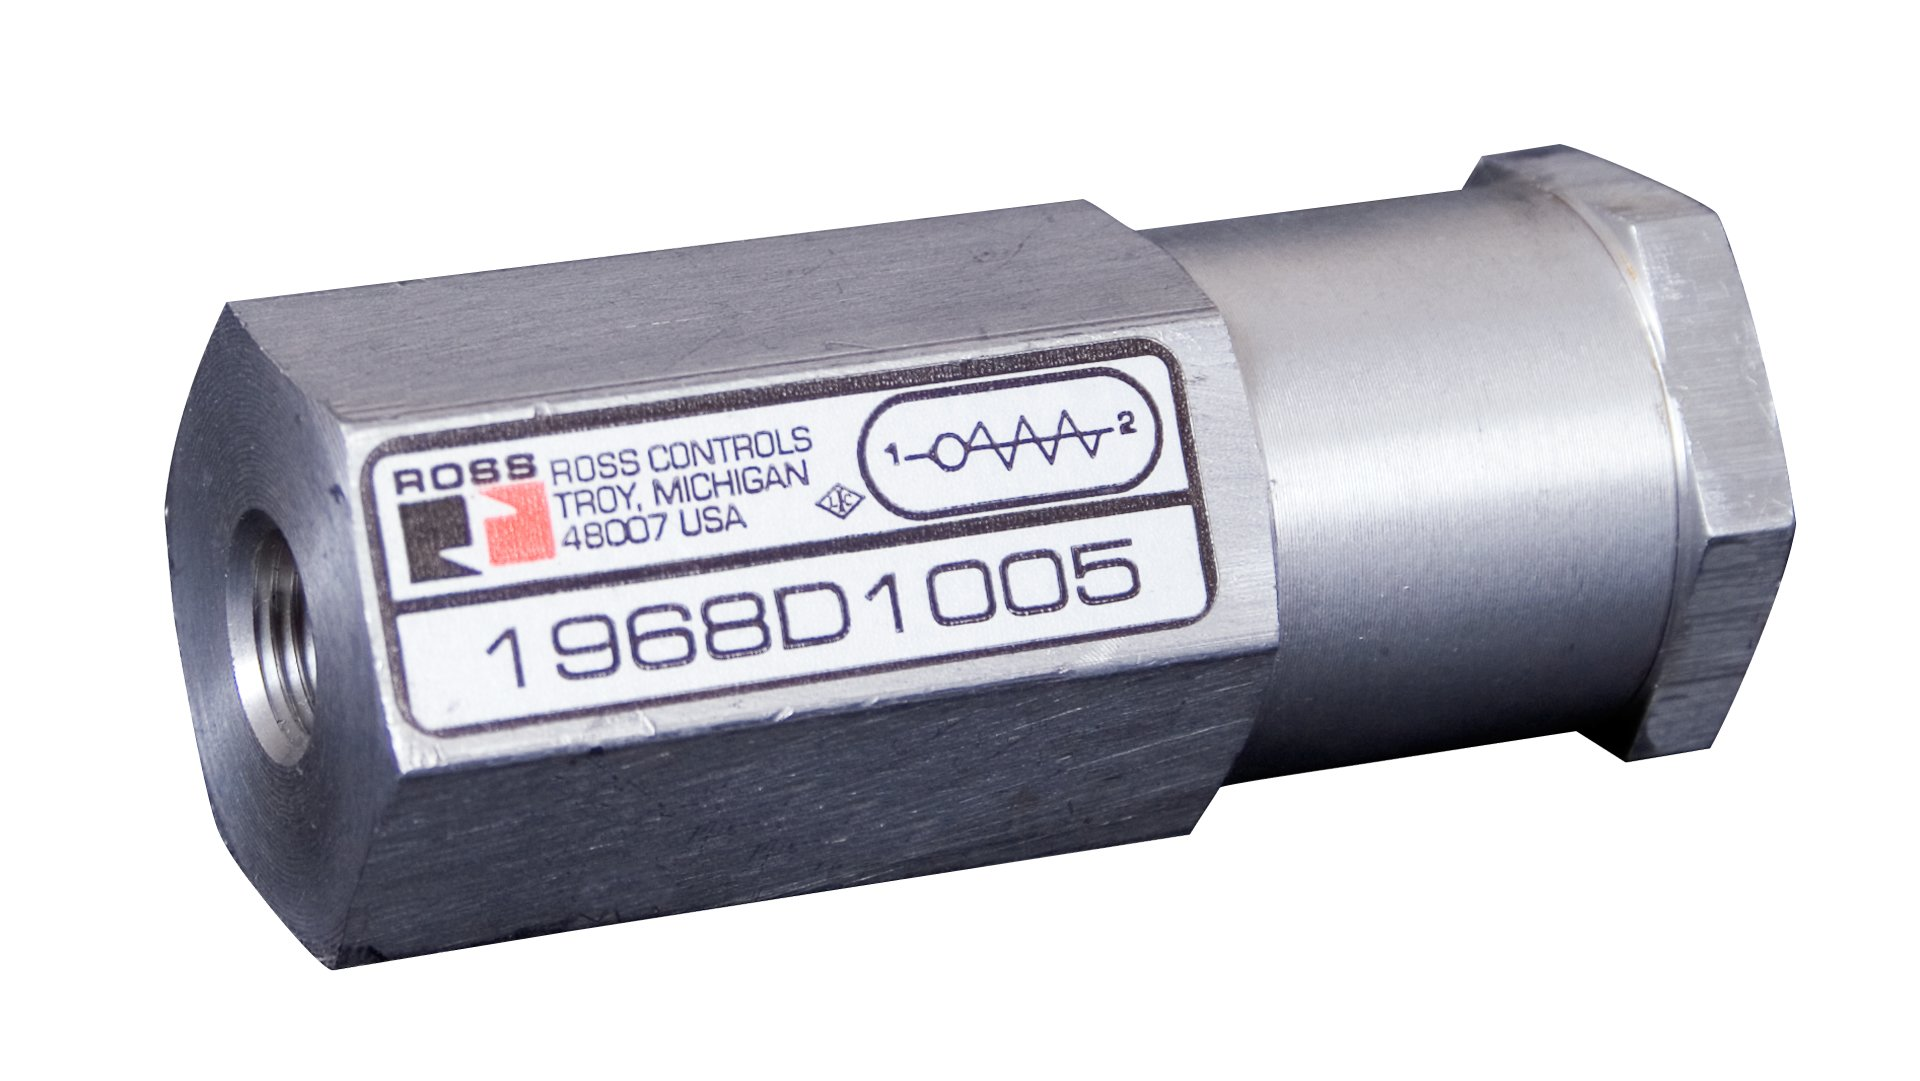 Ross Controls 1968D2005 19 Series Check Valves, Low Profile, Standard Capacity, Inline, 1/4 NPT